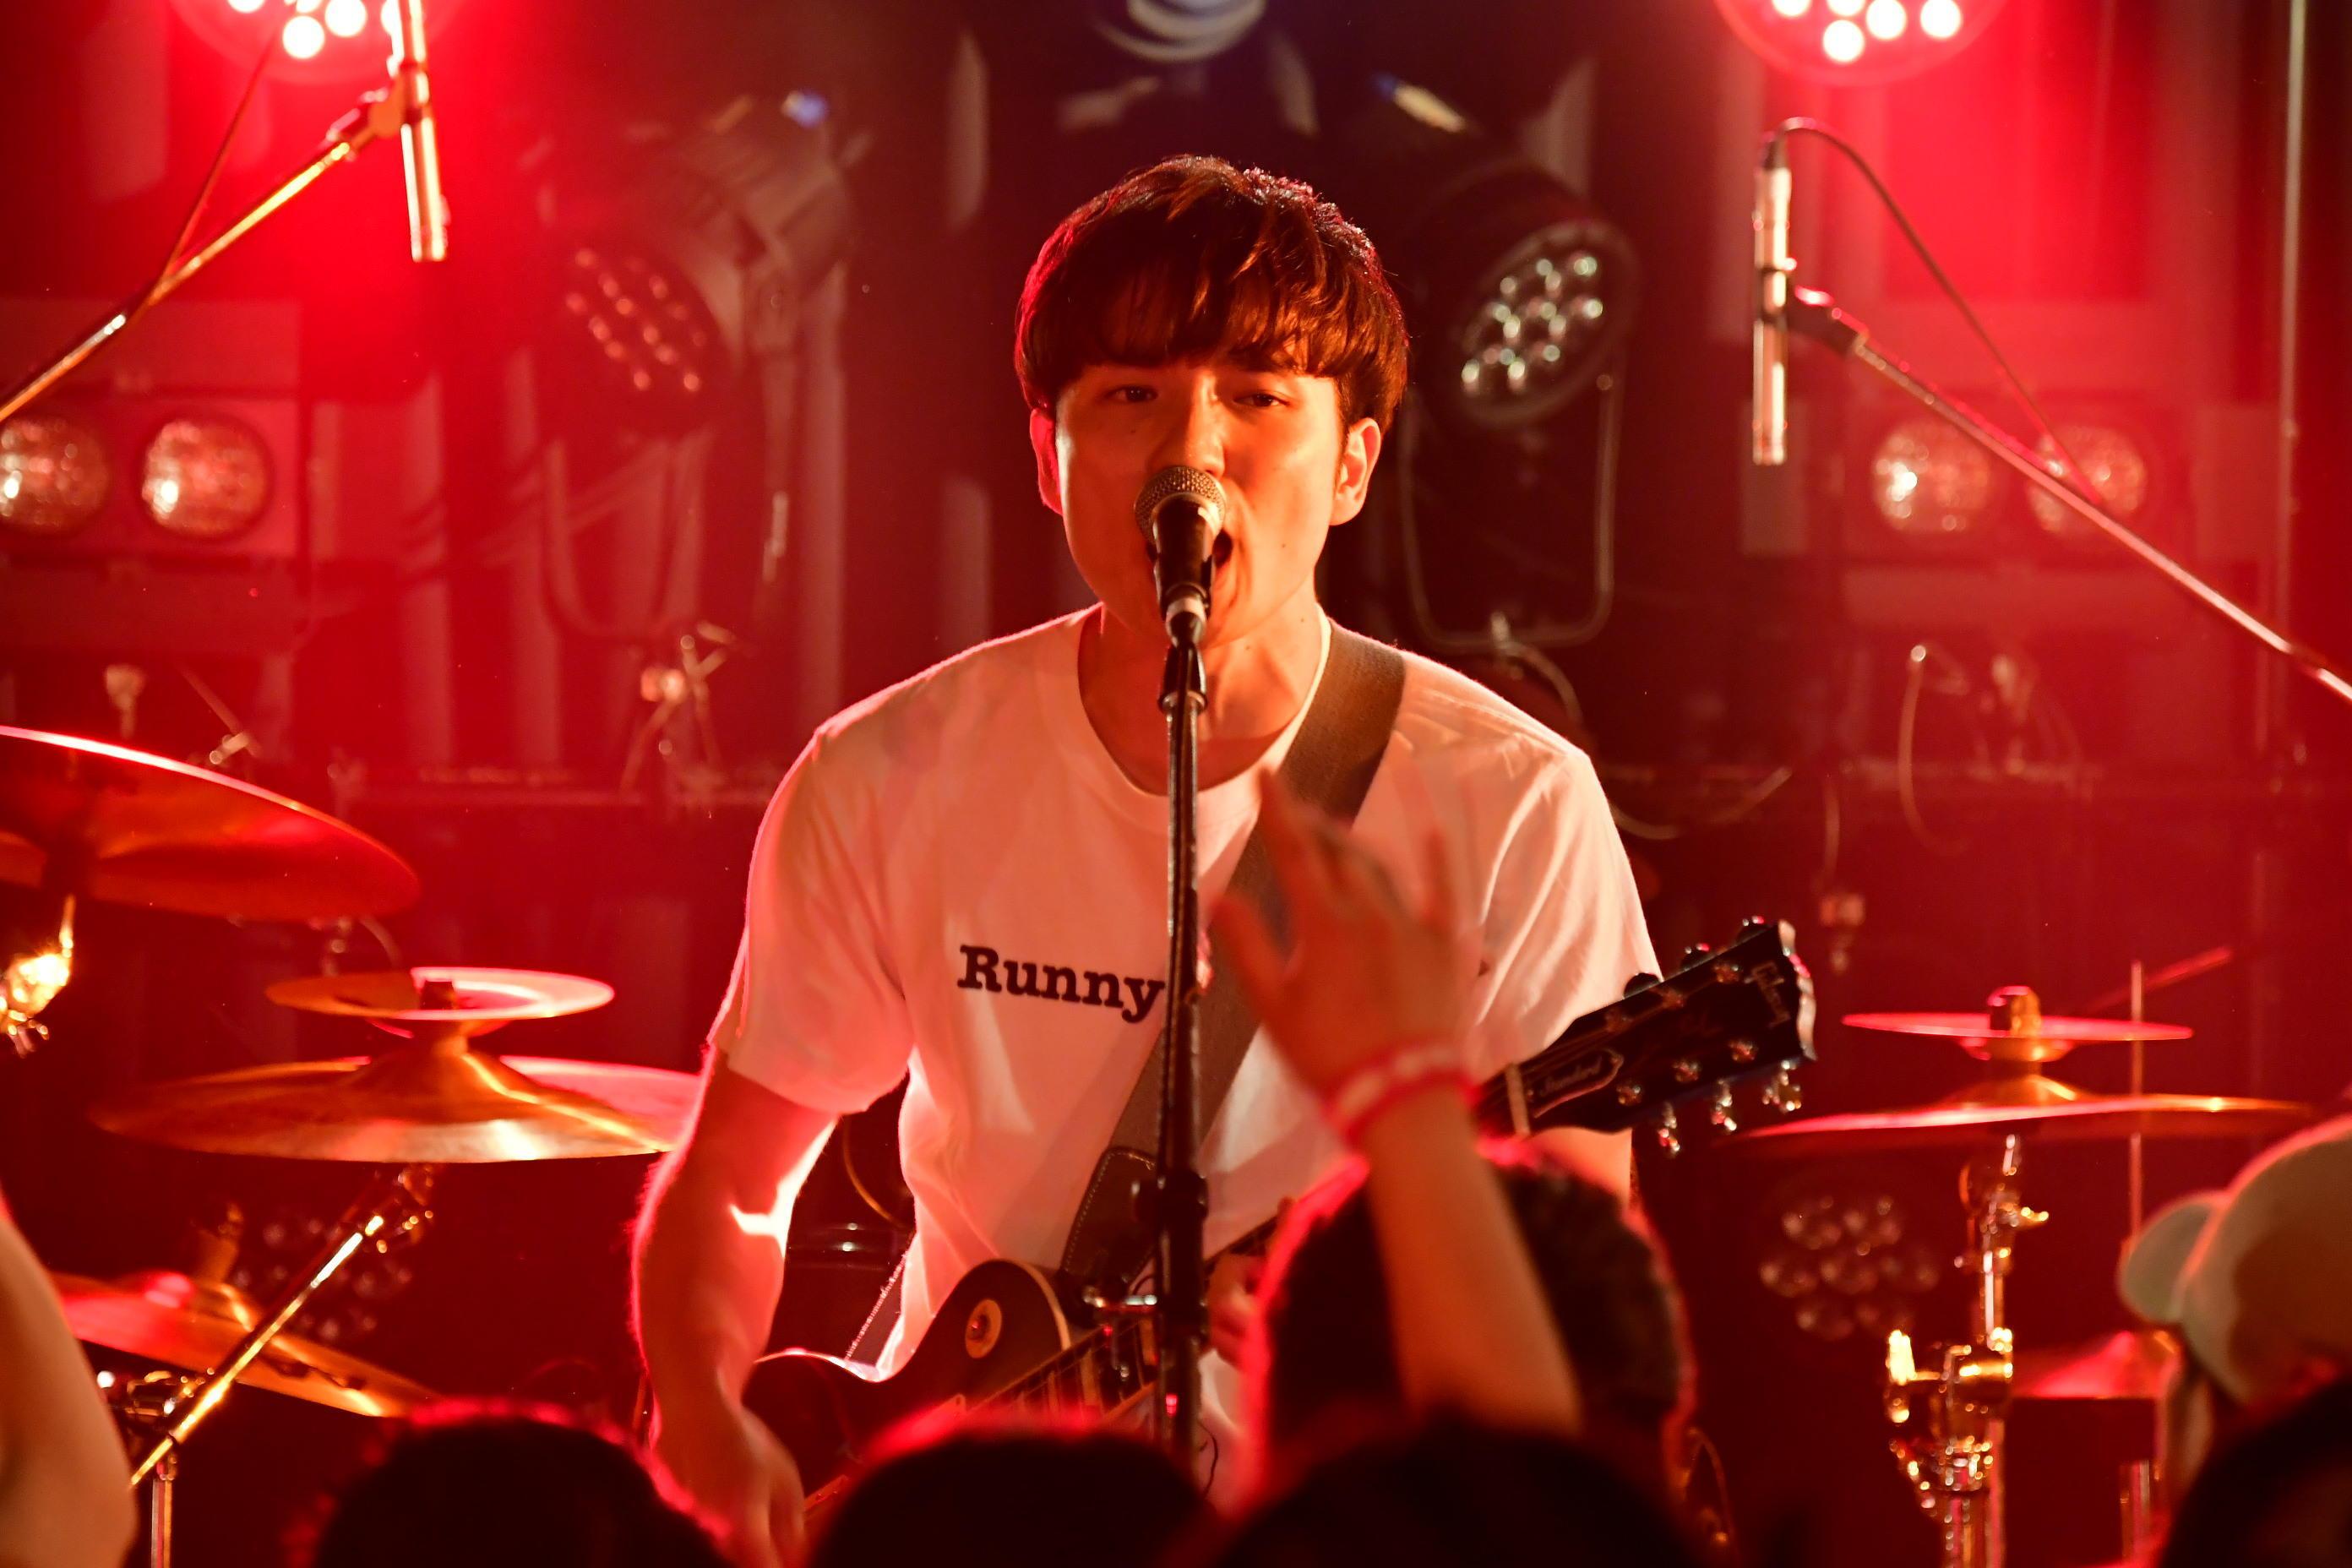 http://news.yoshimoto.co.jp/20180331130256-72aedde3155165801e5ad4428d2e115c31dc8324.jpg